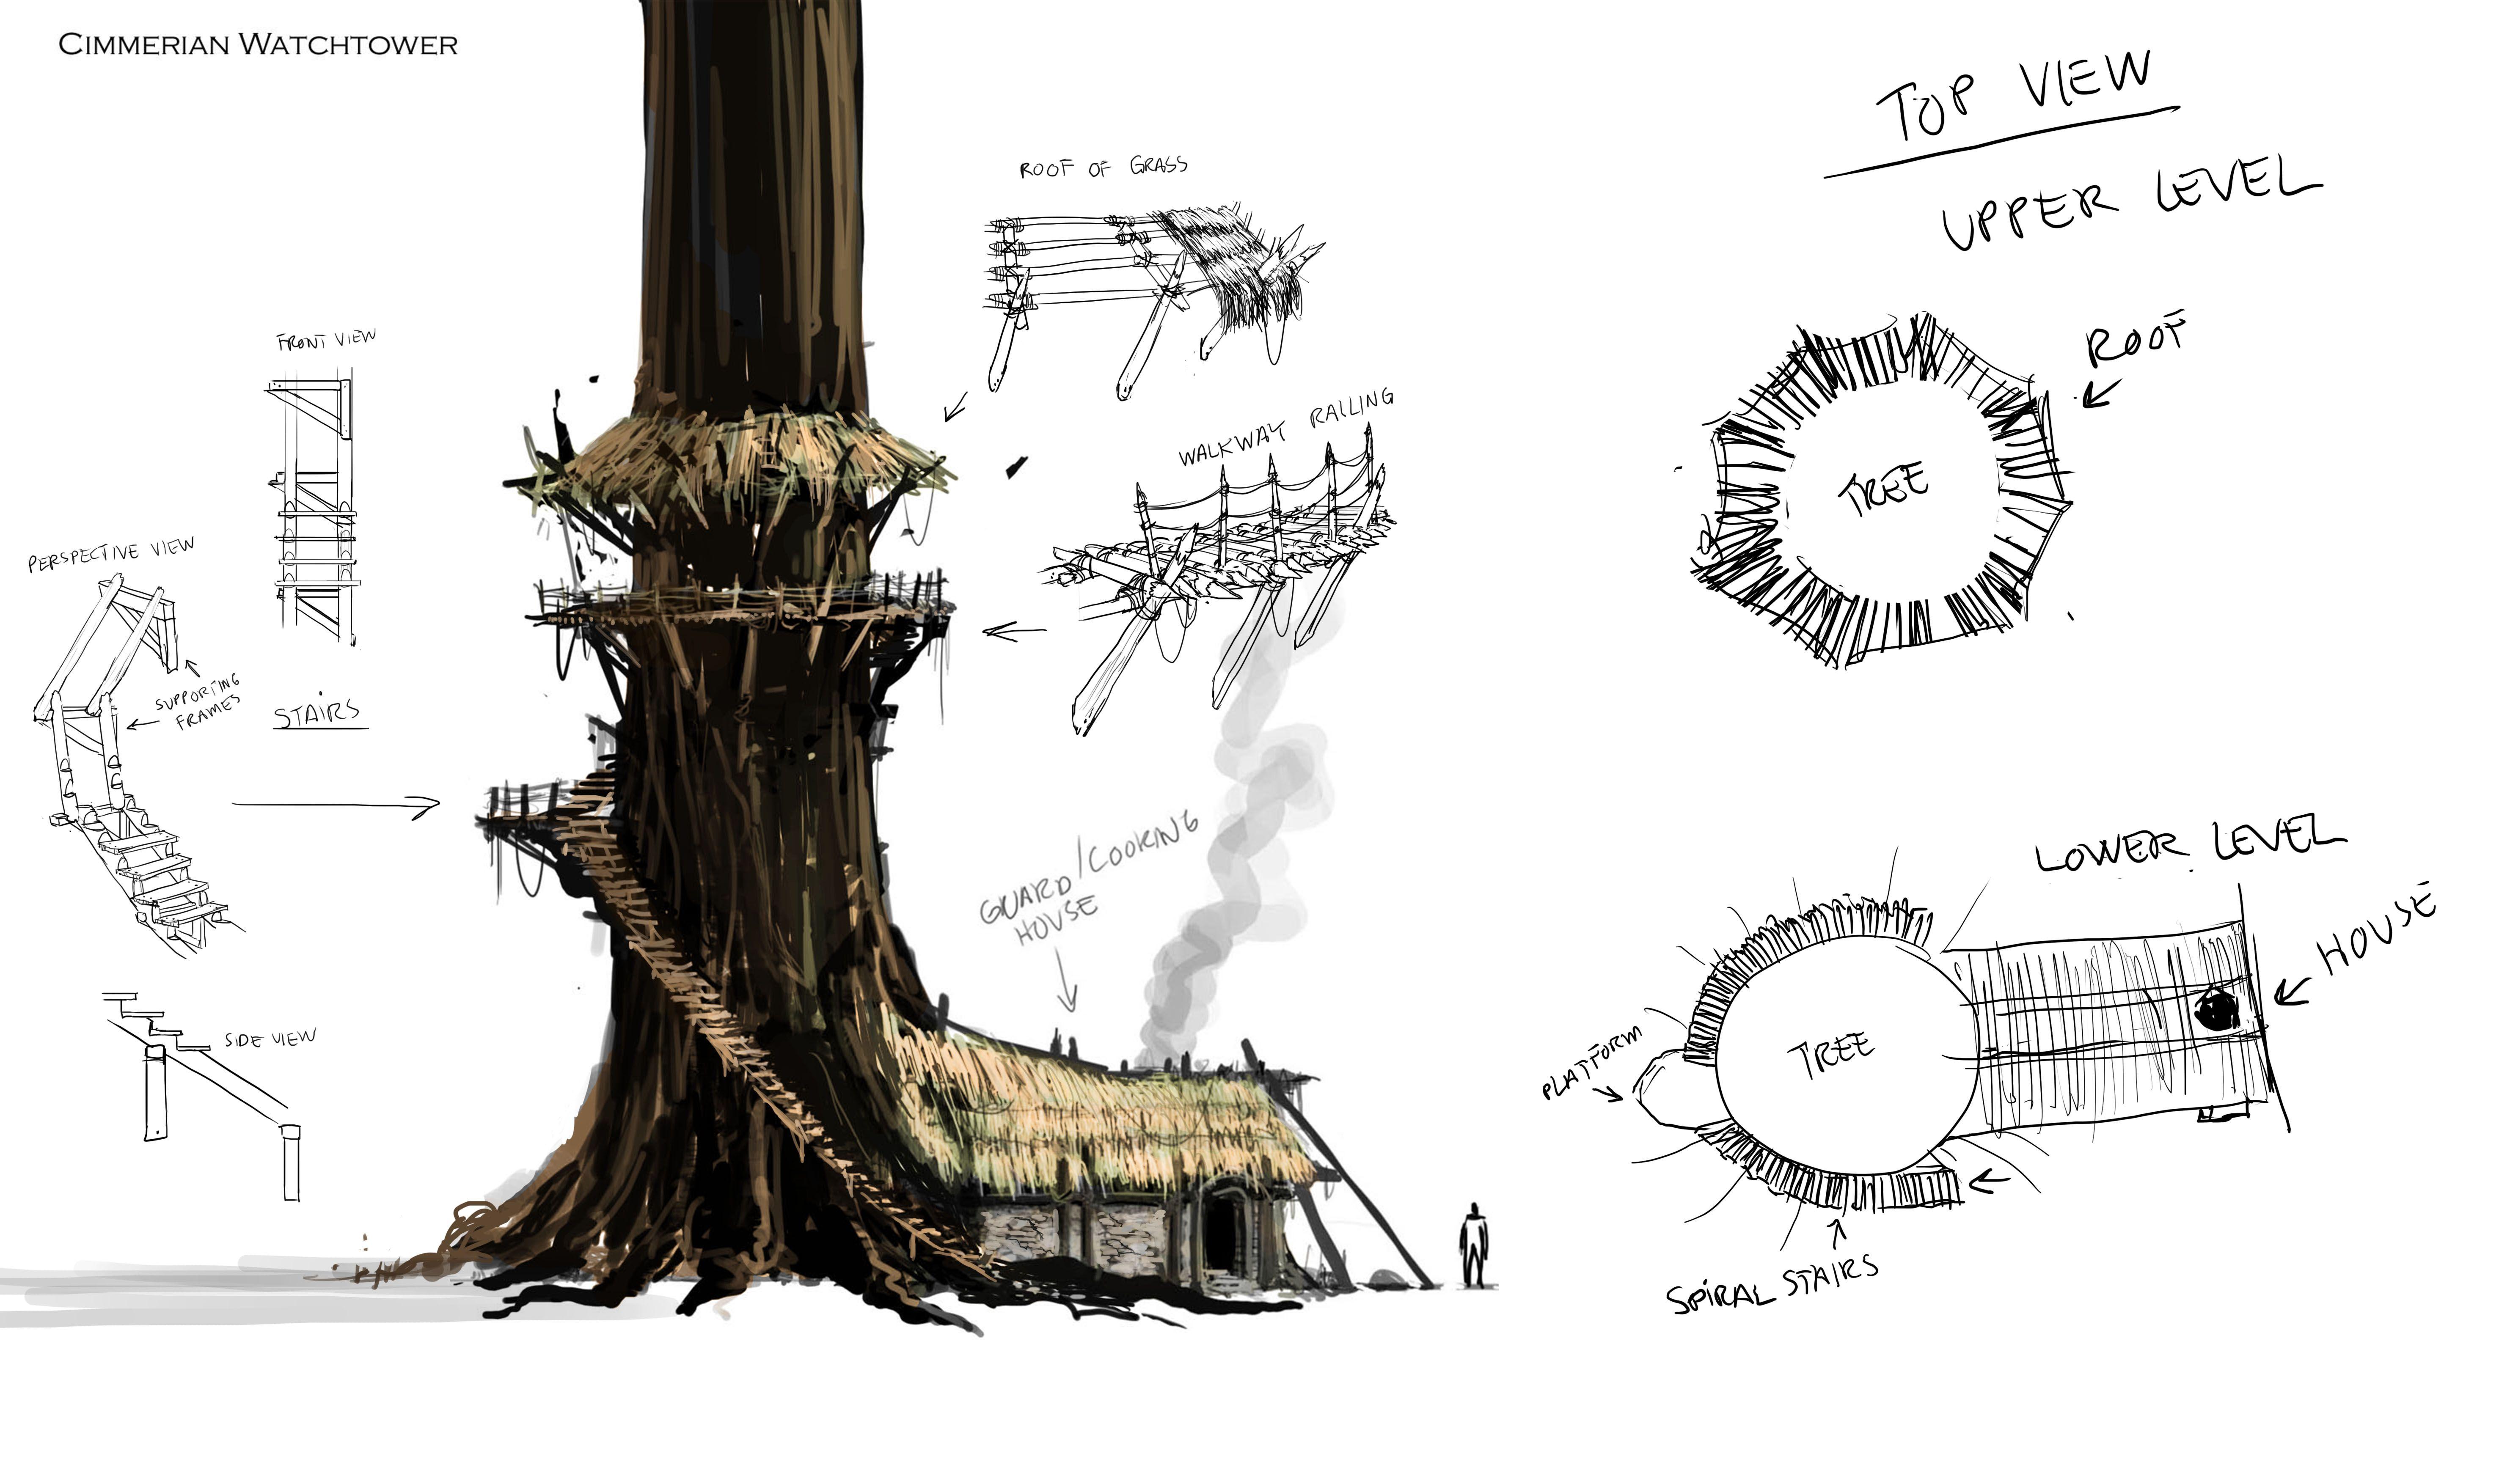 Cimmerian Watchtower Watch Tower Environment Concept Art Fantasy Map